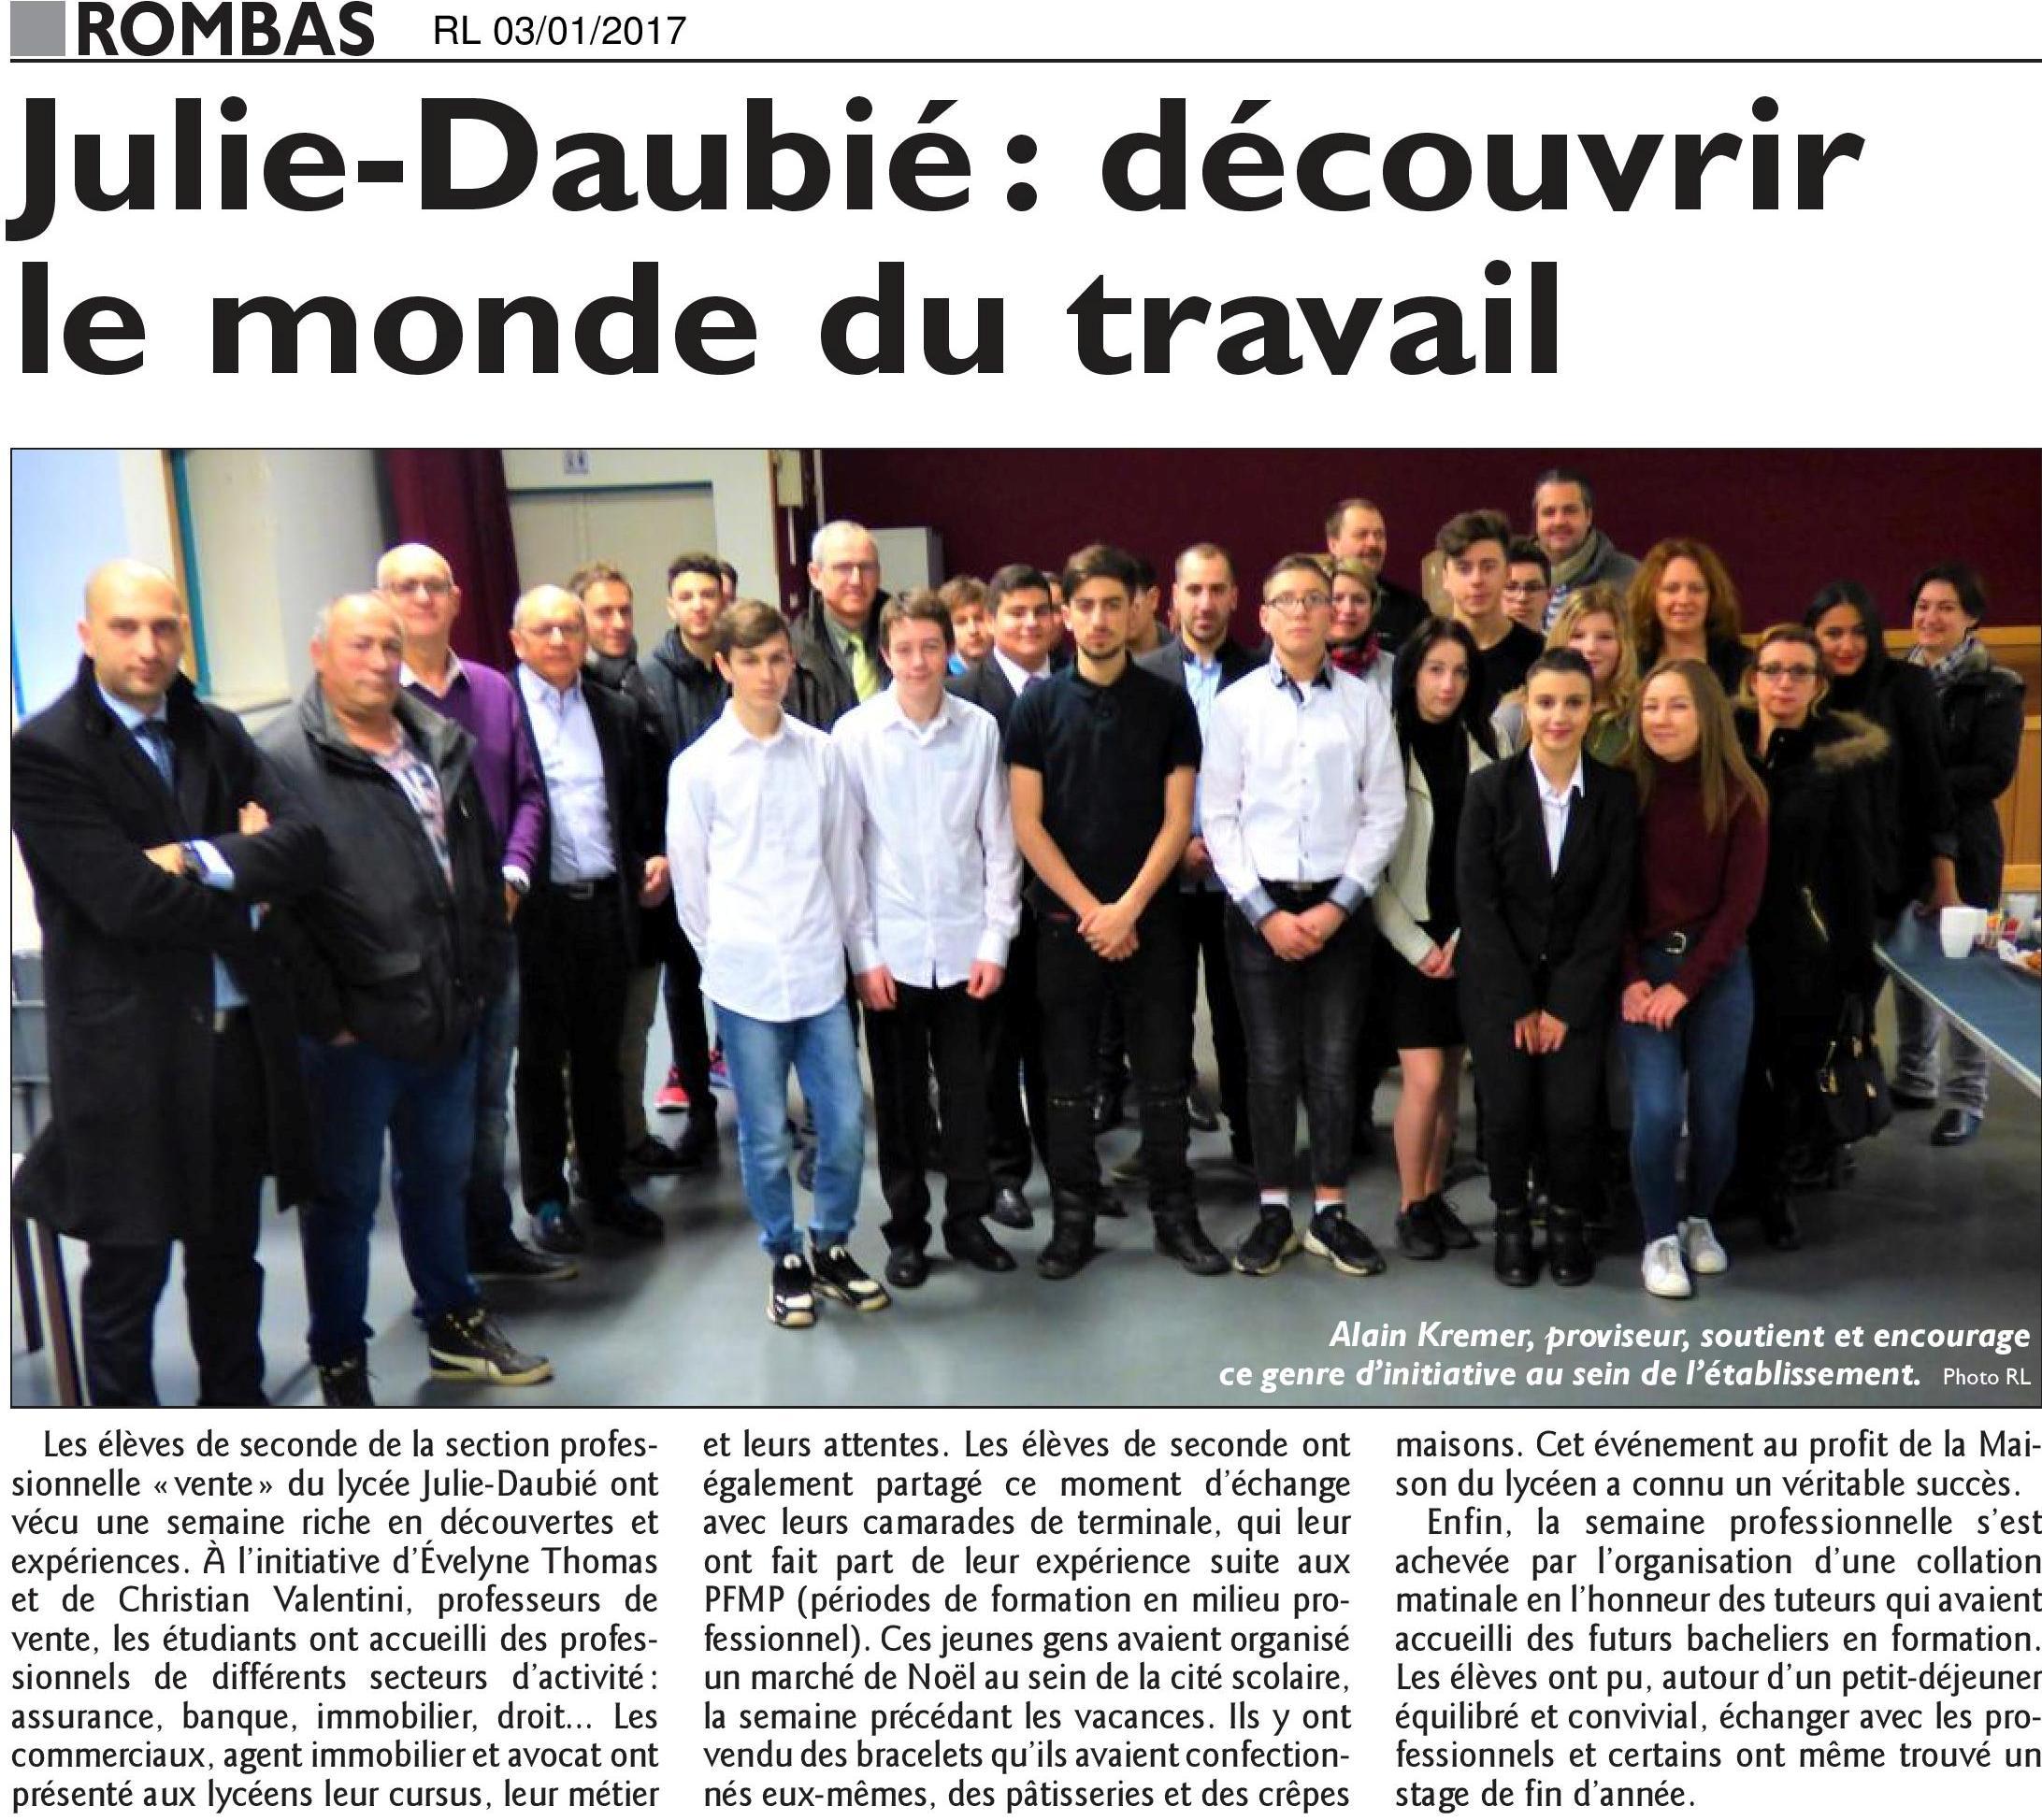 julie-daubie-et-monde-du-travail-page-001